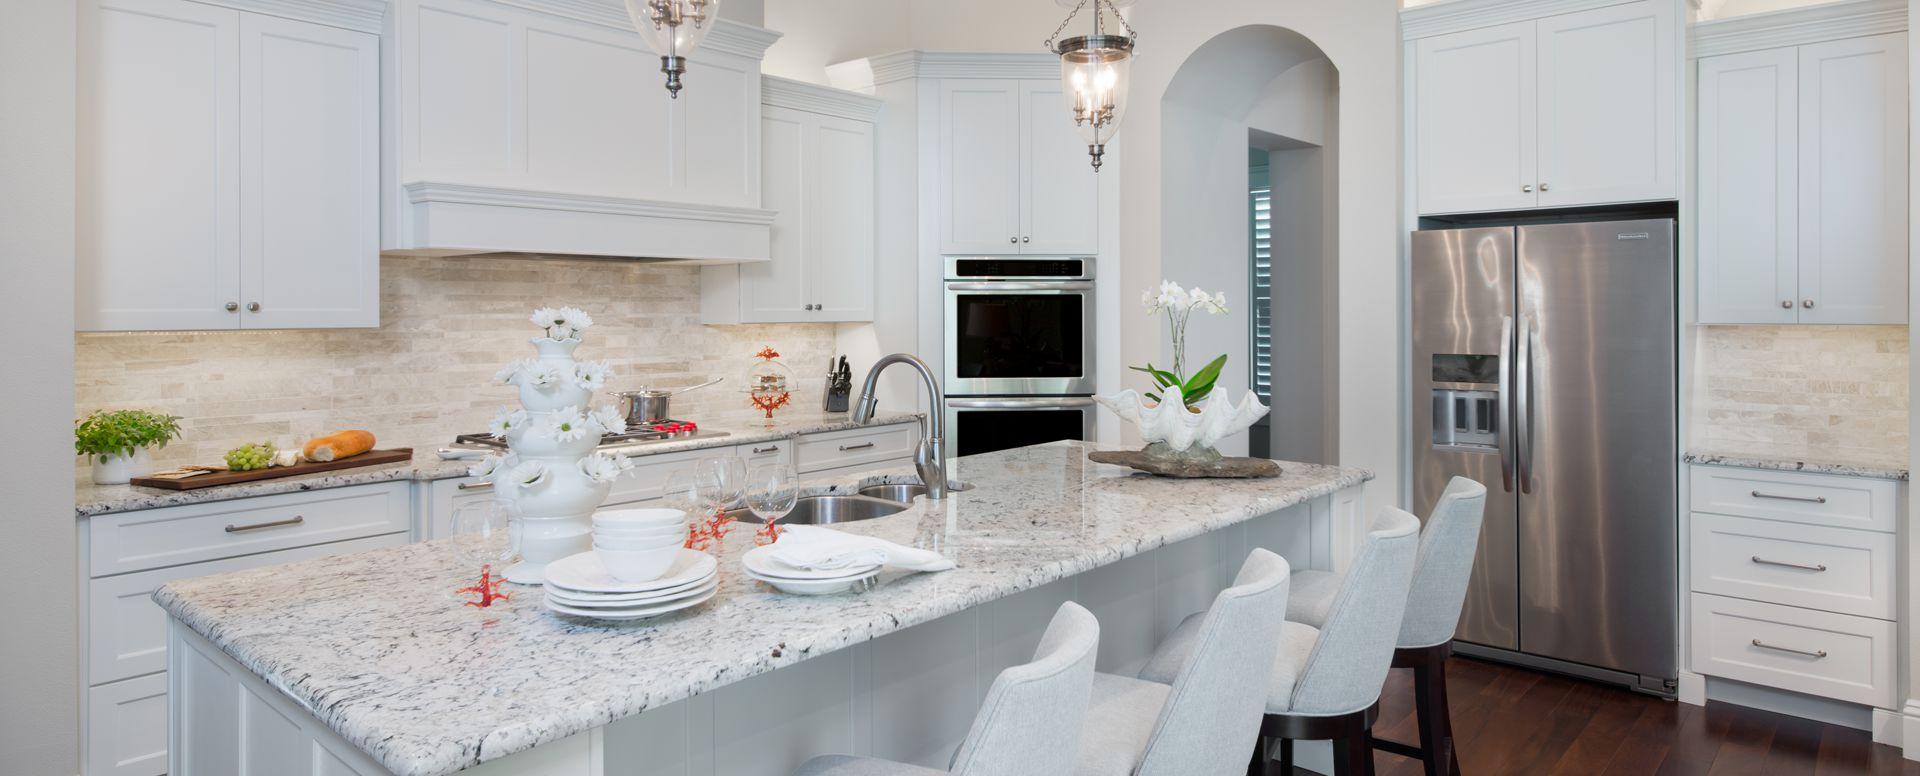 interiors british west indies florida style home kitchen - British West Indies Interior Design